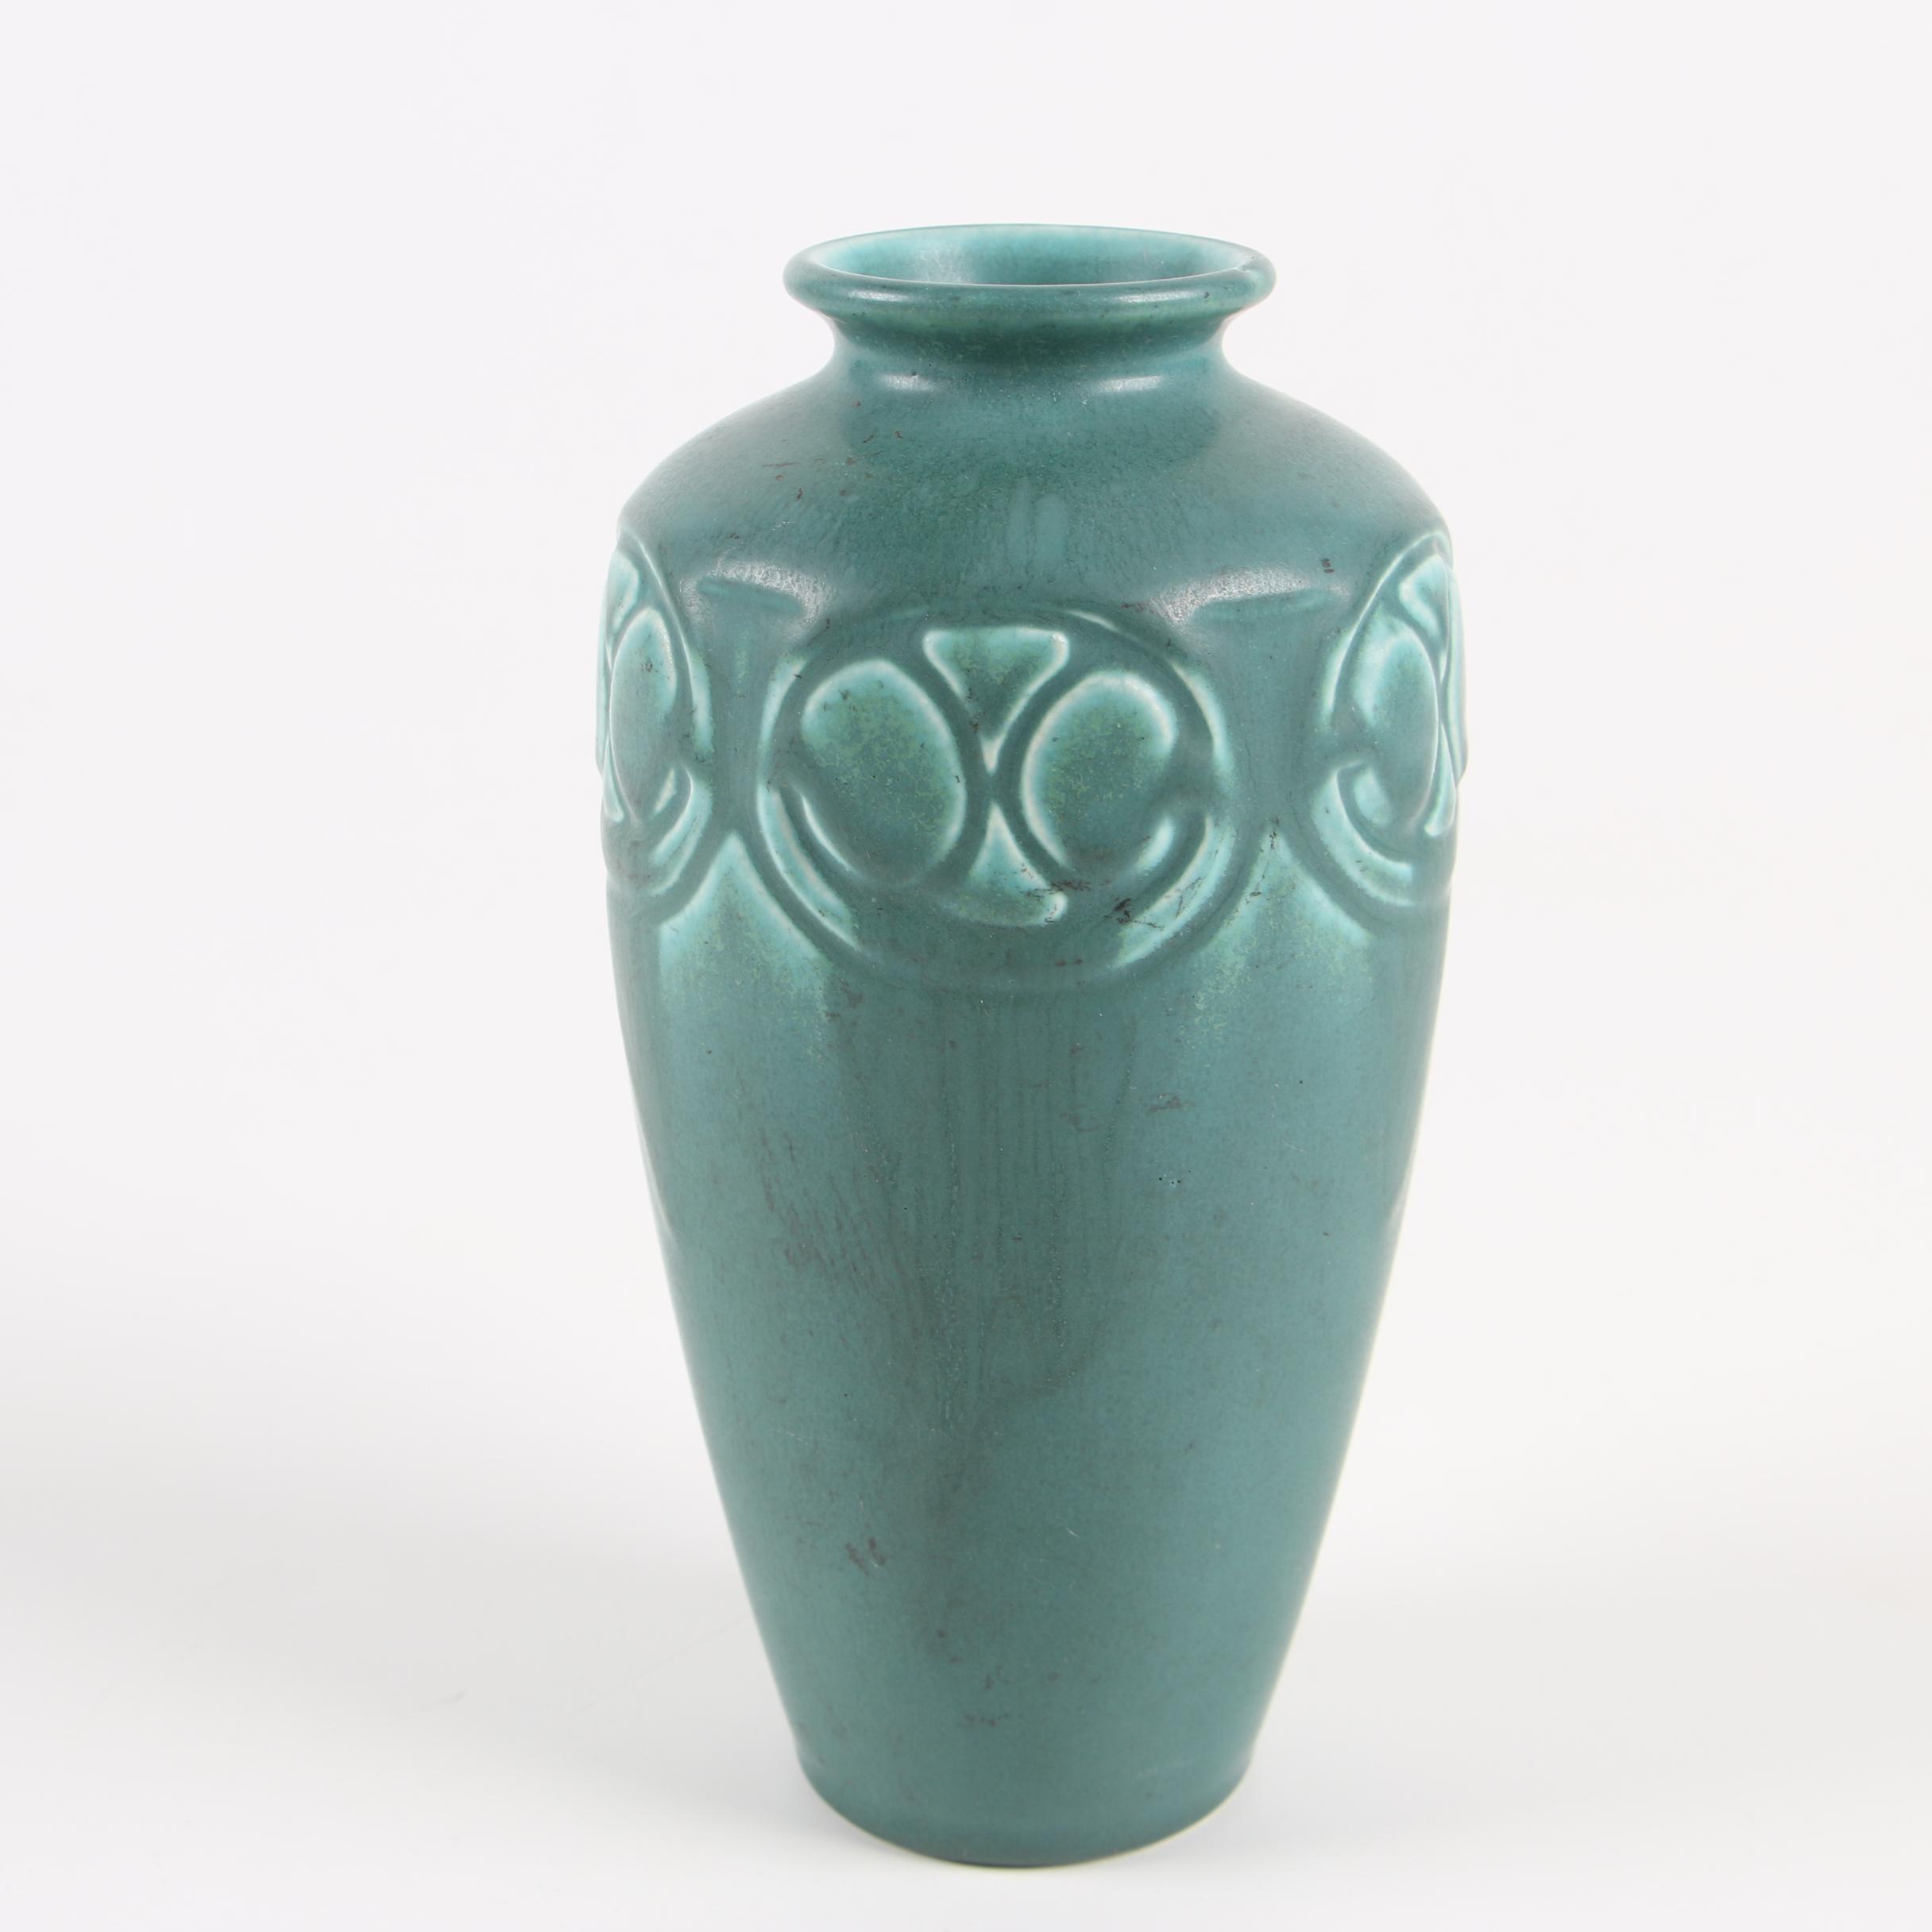 Rookwood Pottery Matte Green Glaze Vase, 1926